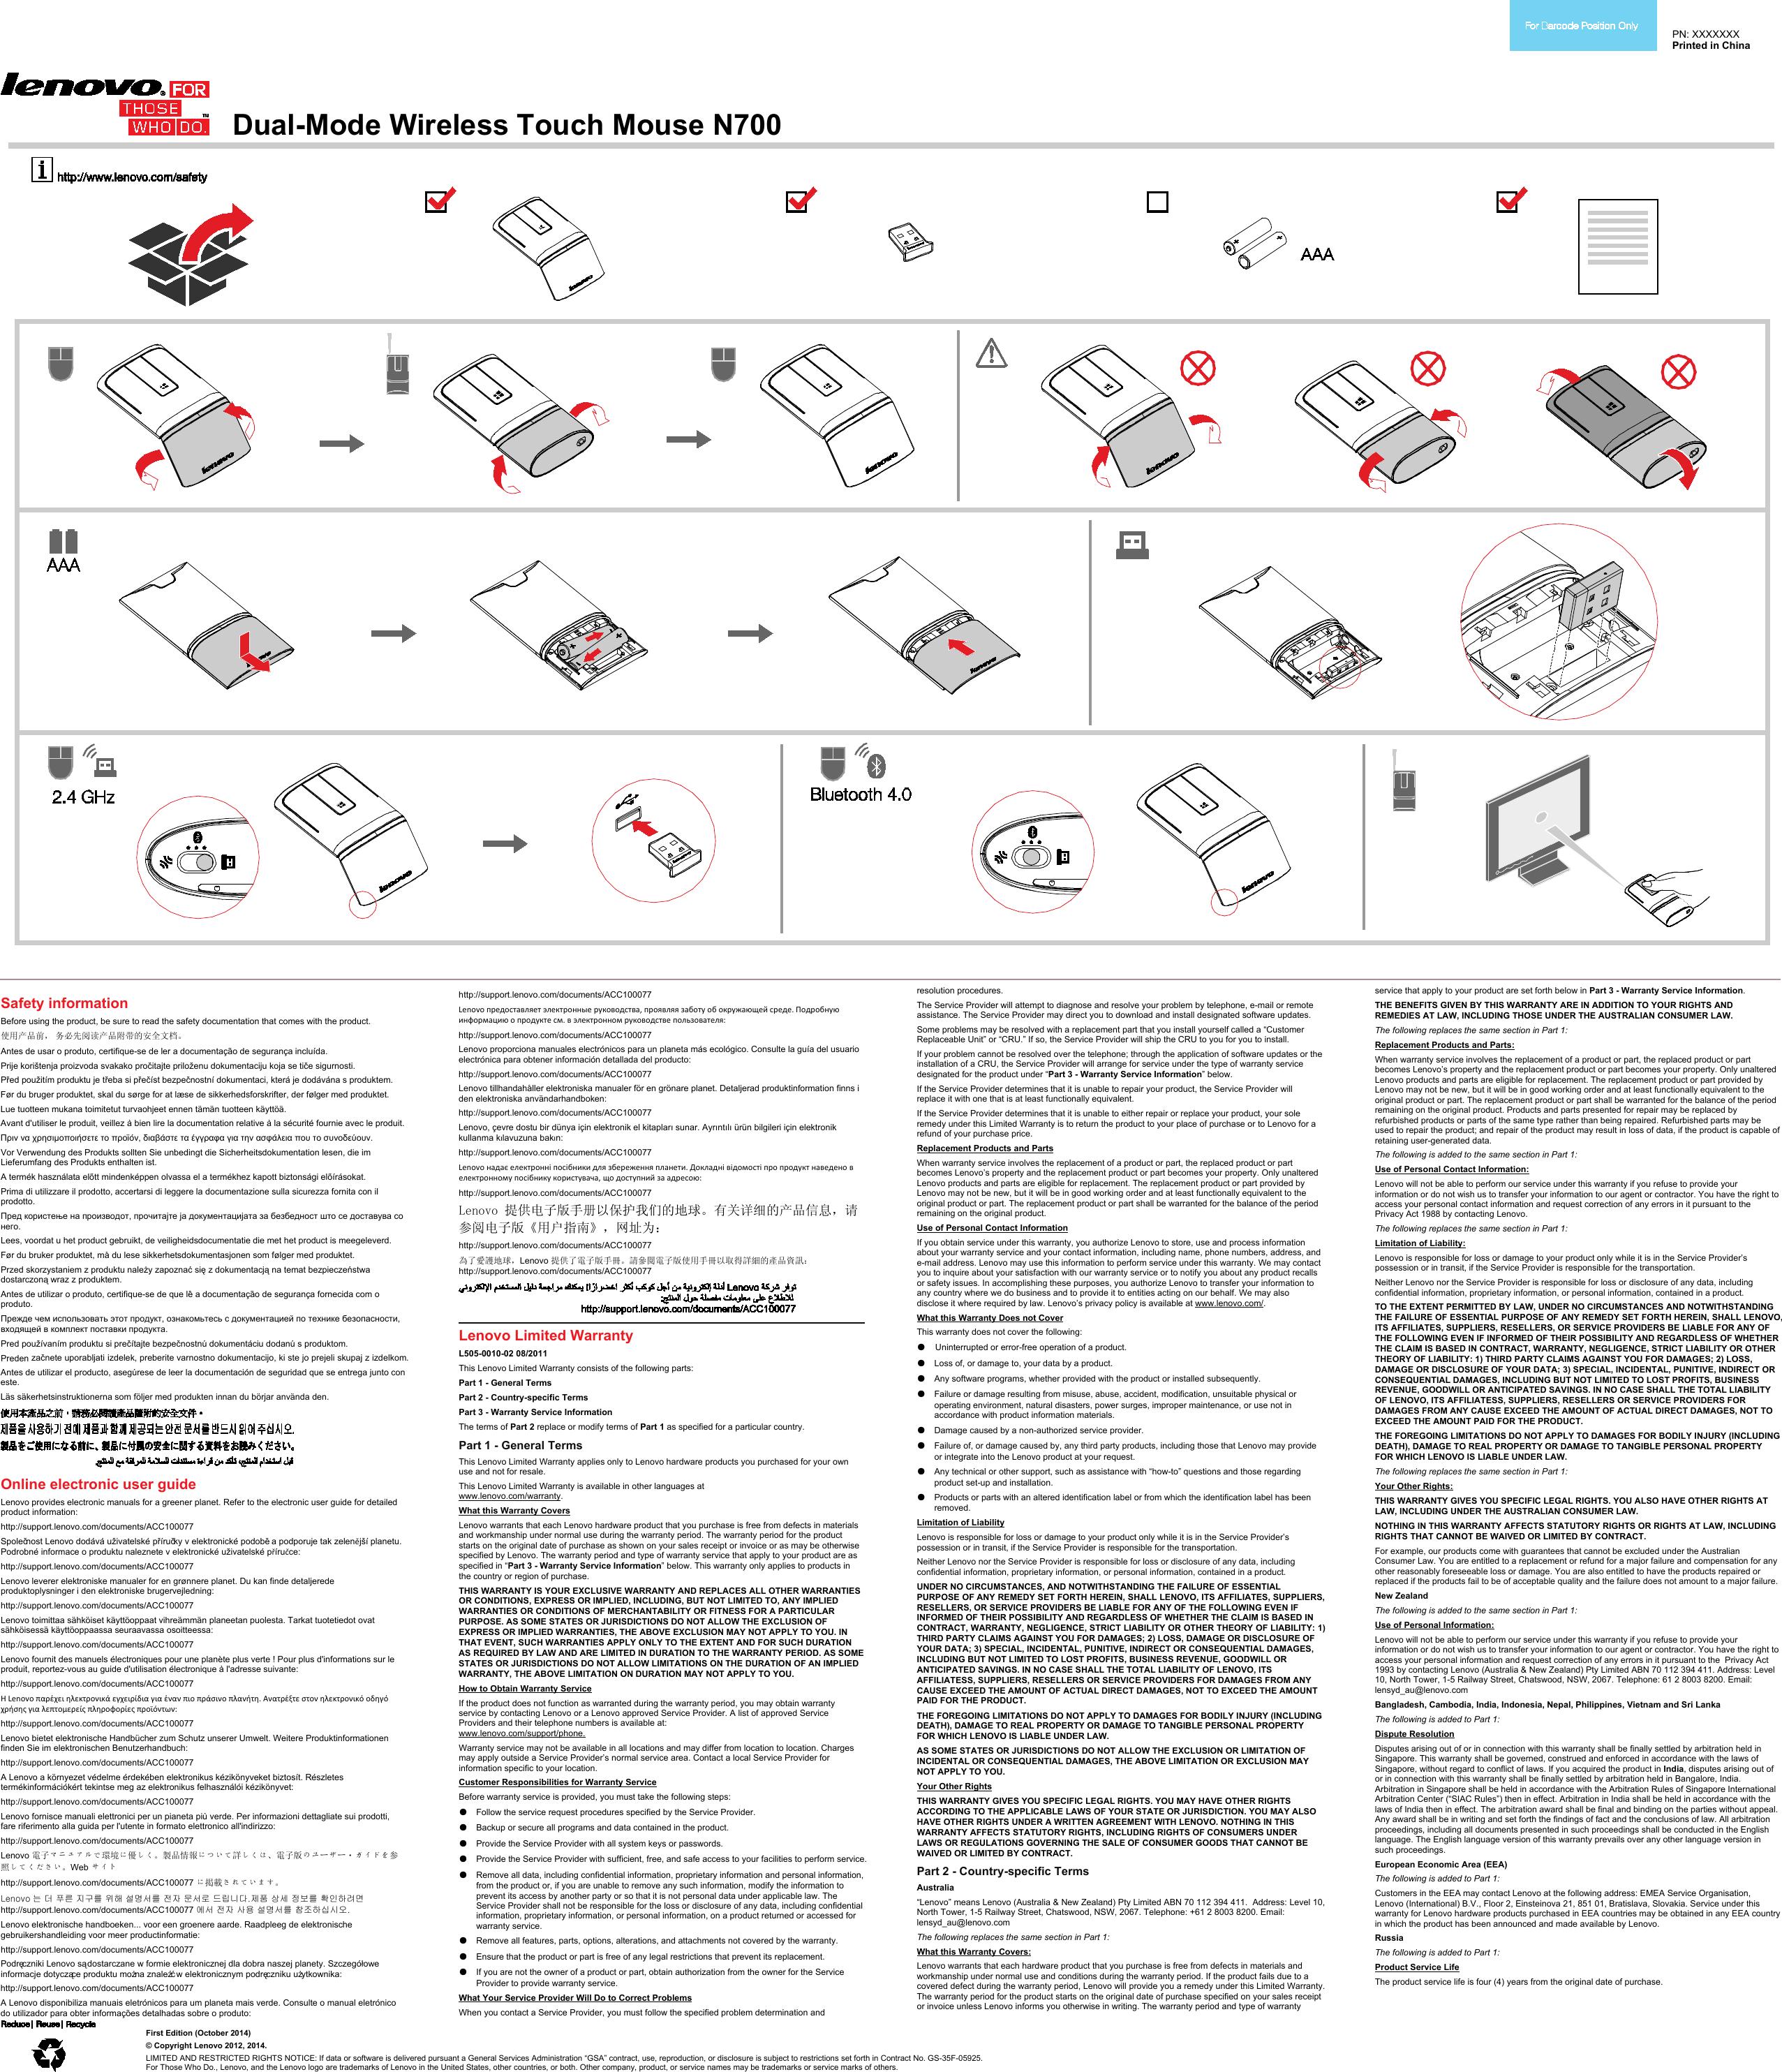 Lenovo Dual Mode Wl Touch Mouse N700 Ug V1 0 Wireless User Manual G50 80 Laptop Lenovo Type